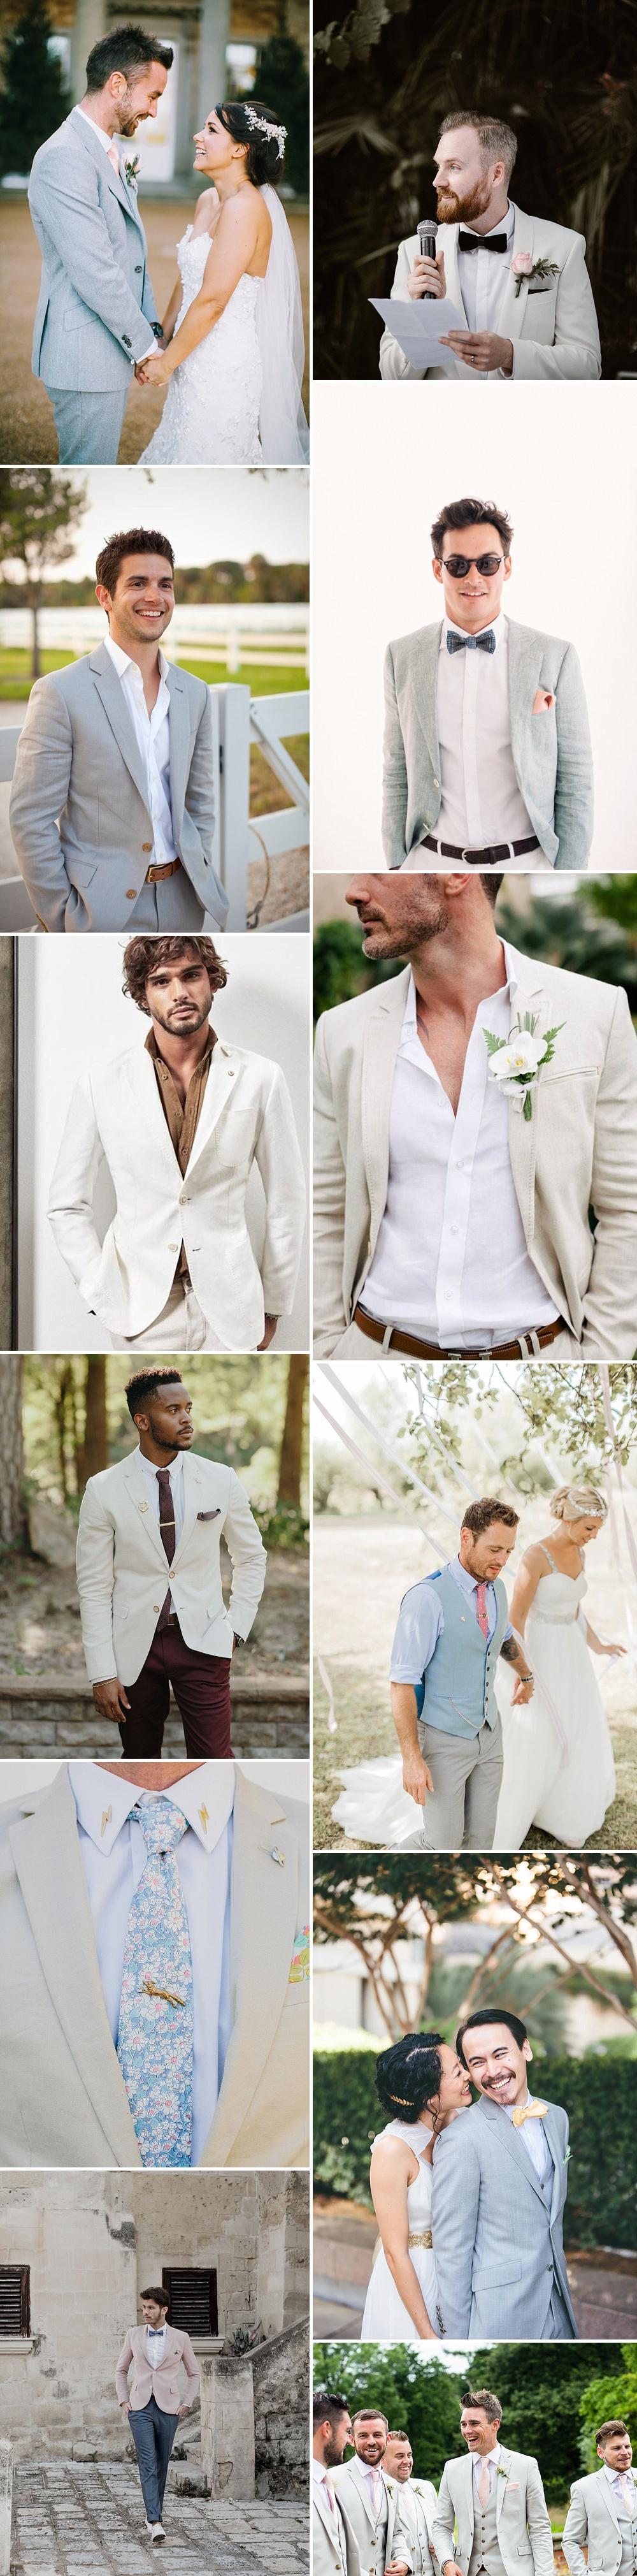 Groom Wearing Light Coloured Jacket For Wedding | Groom Fashion Inspiration